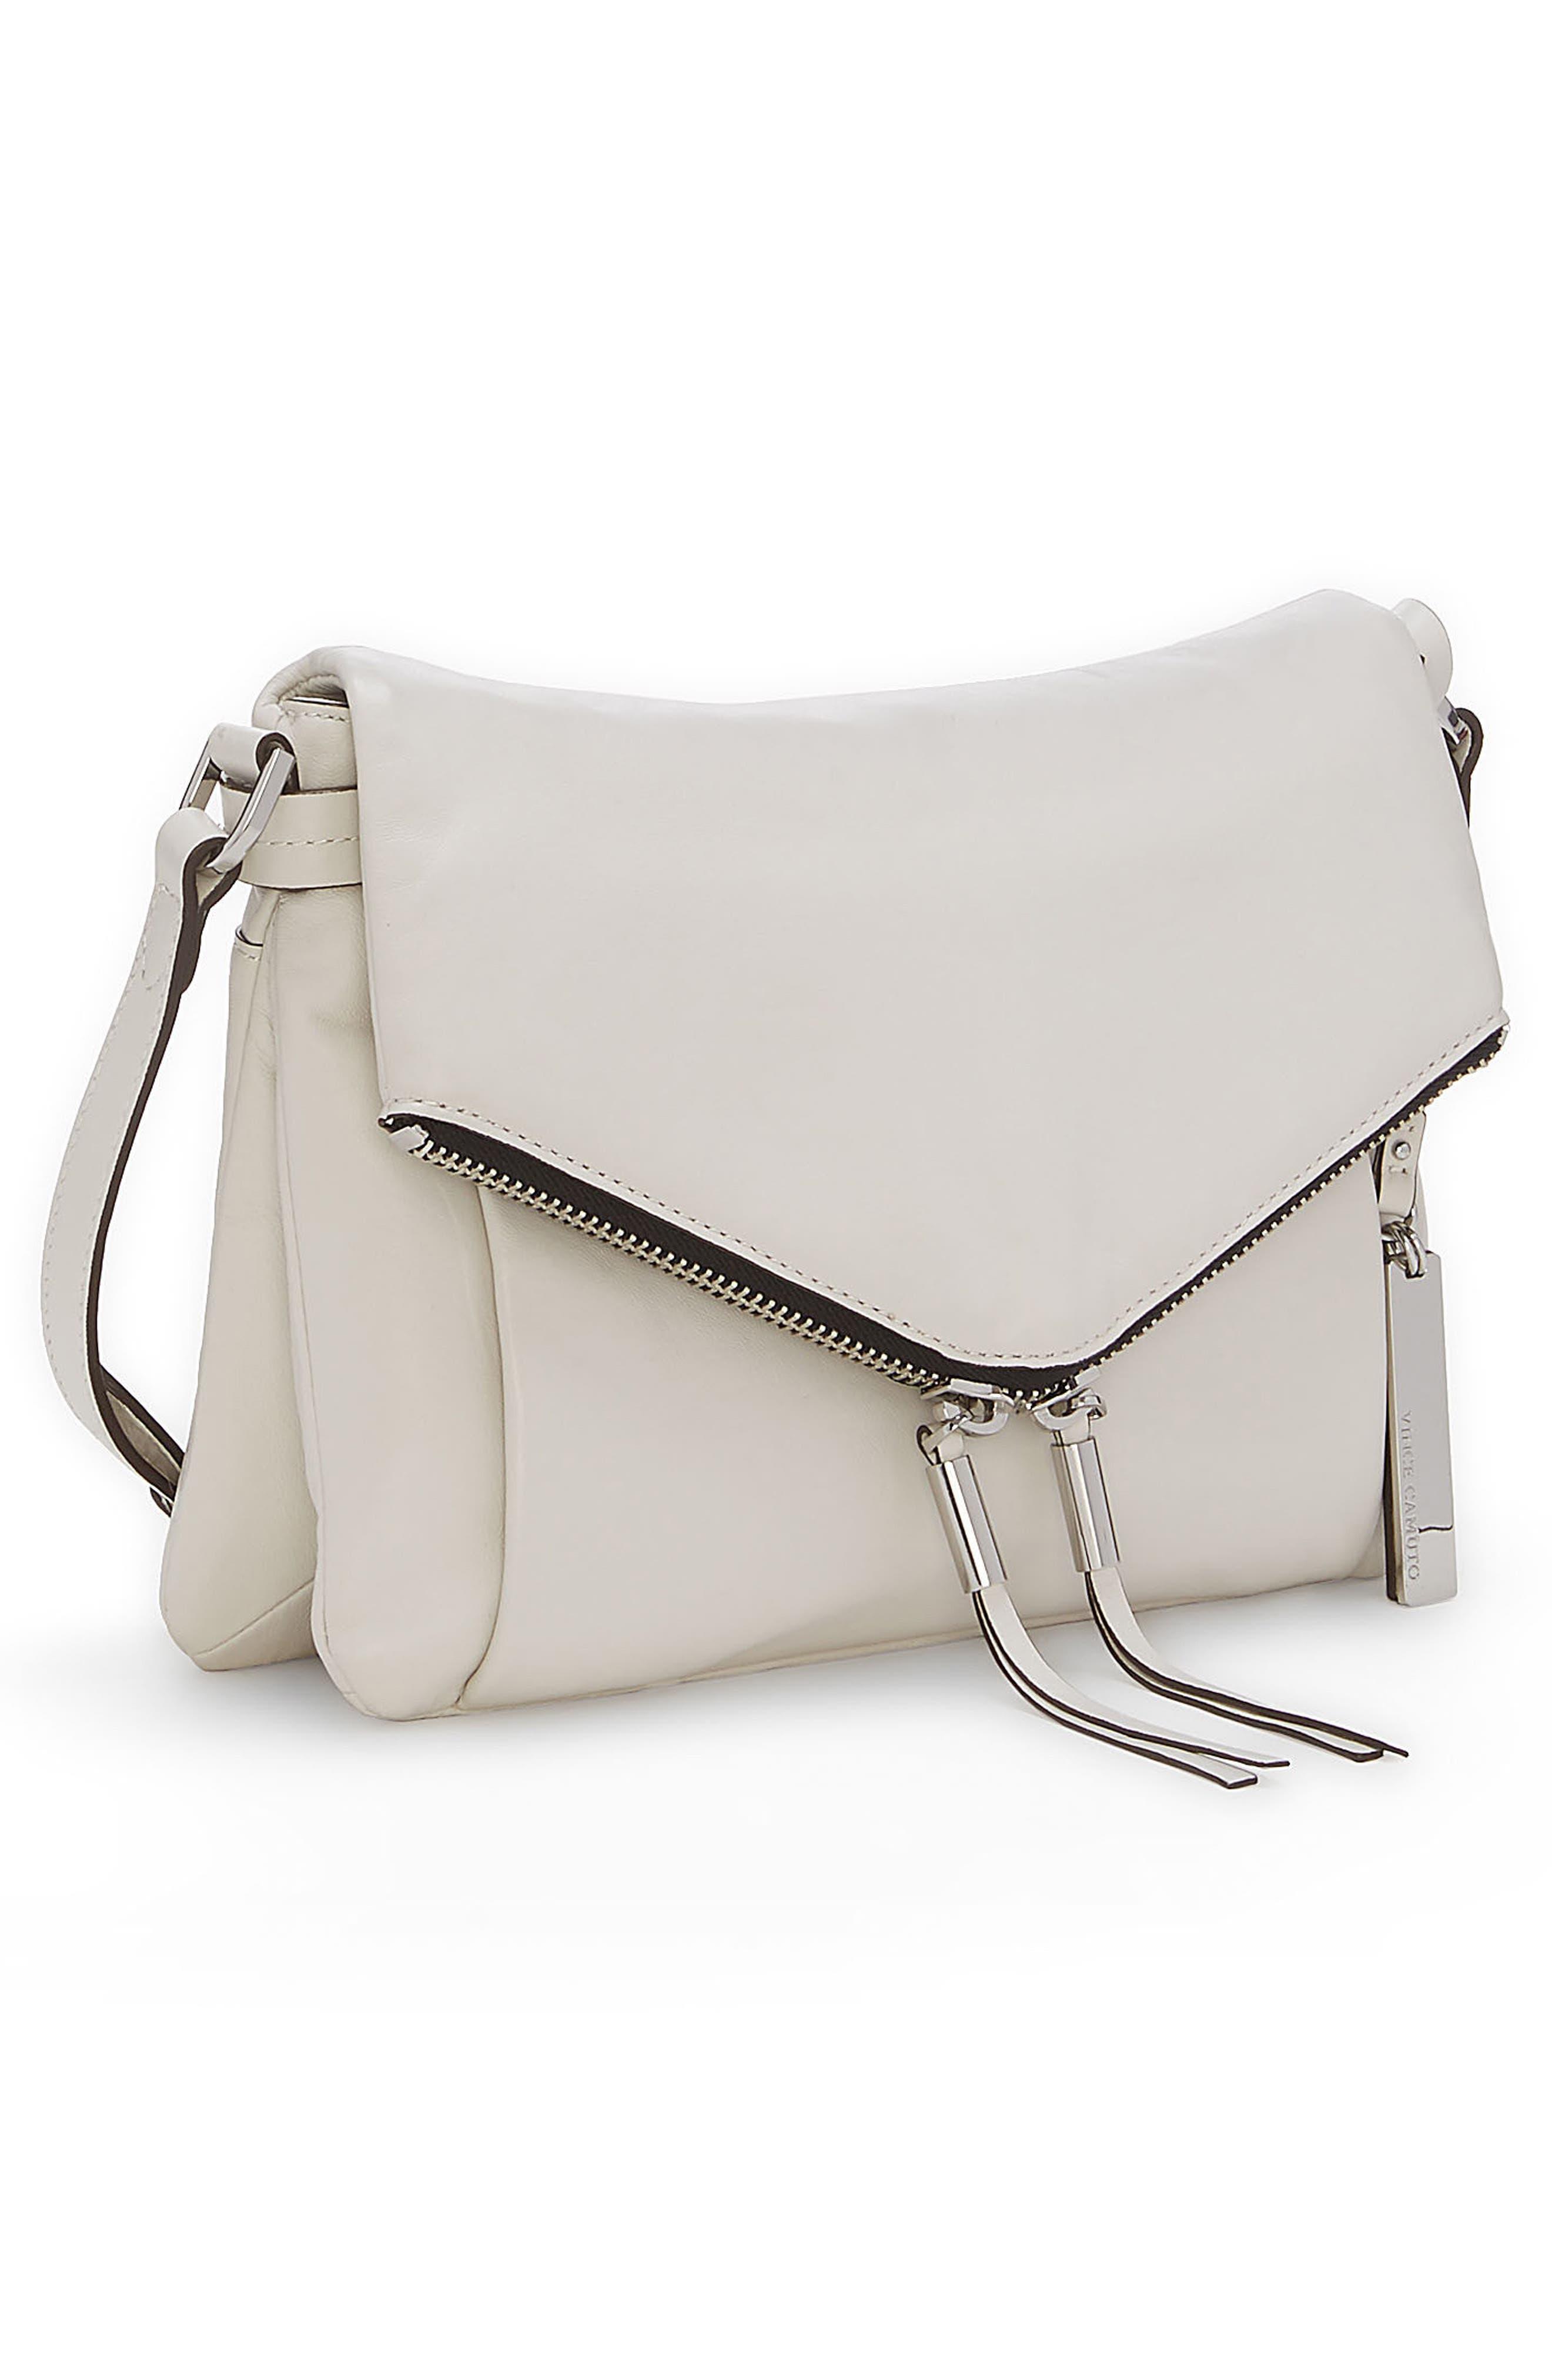 Alder Leather Crossbody Bag,                             Alternate thumbnail 11, color,